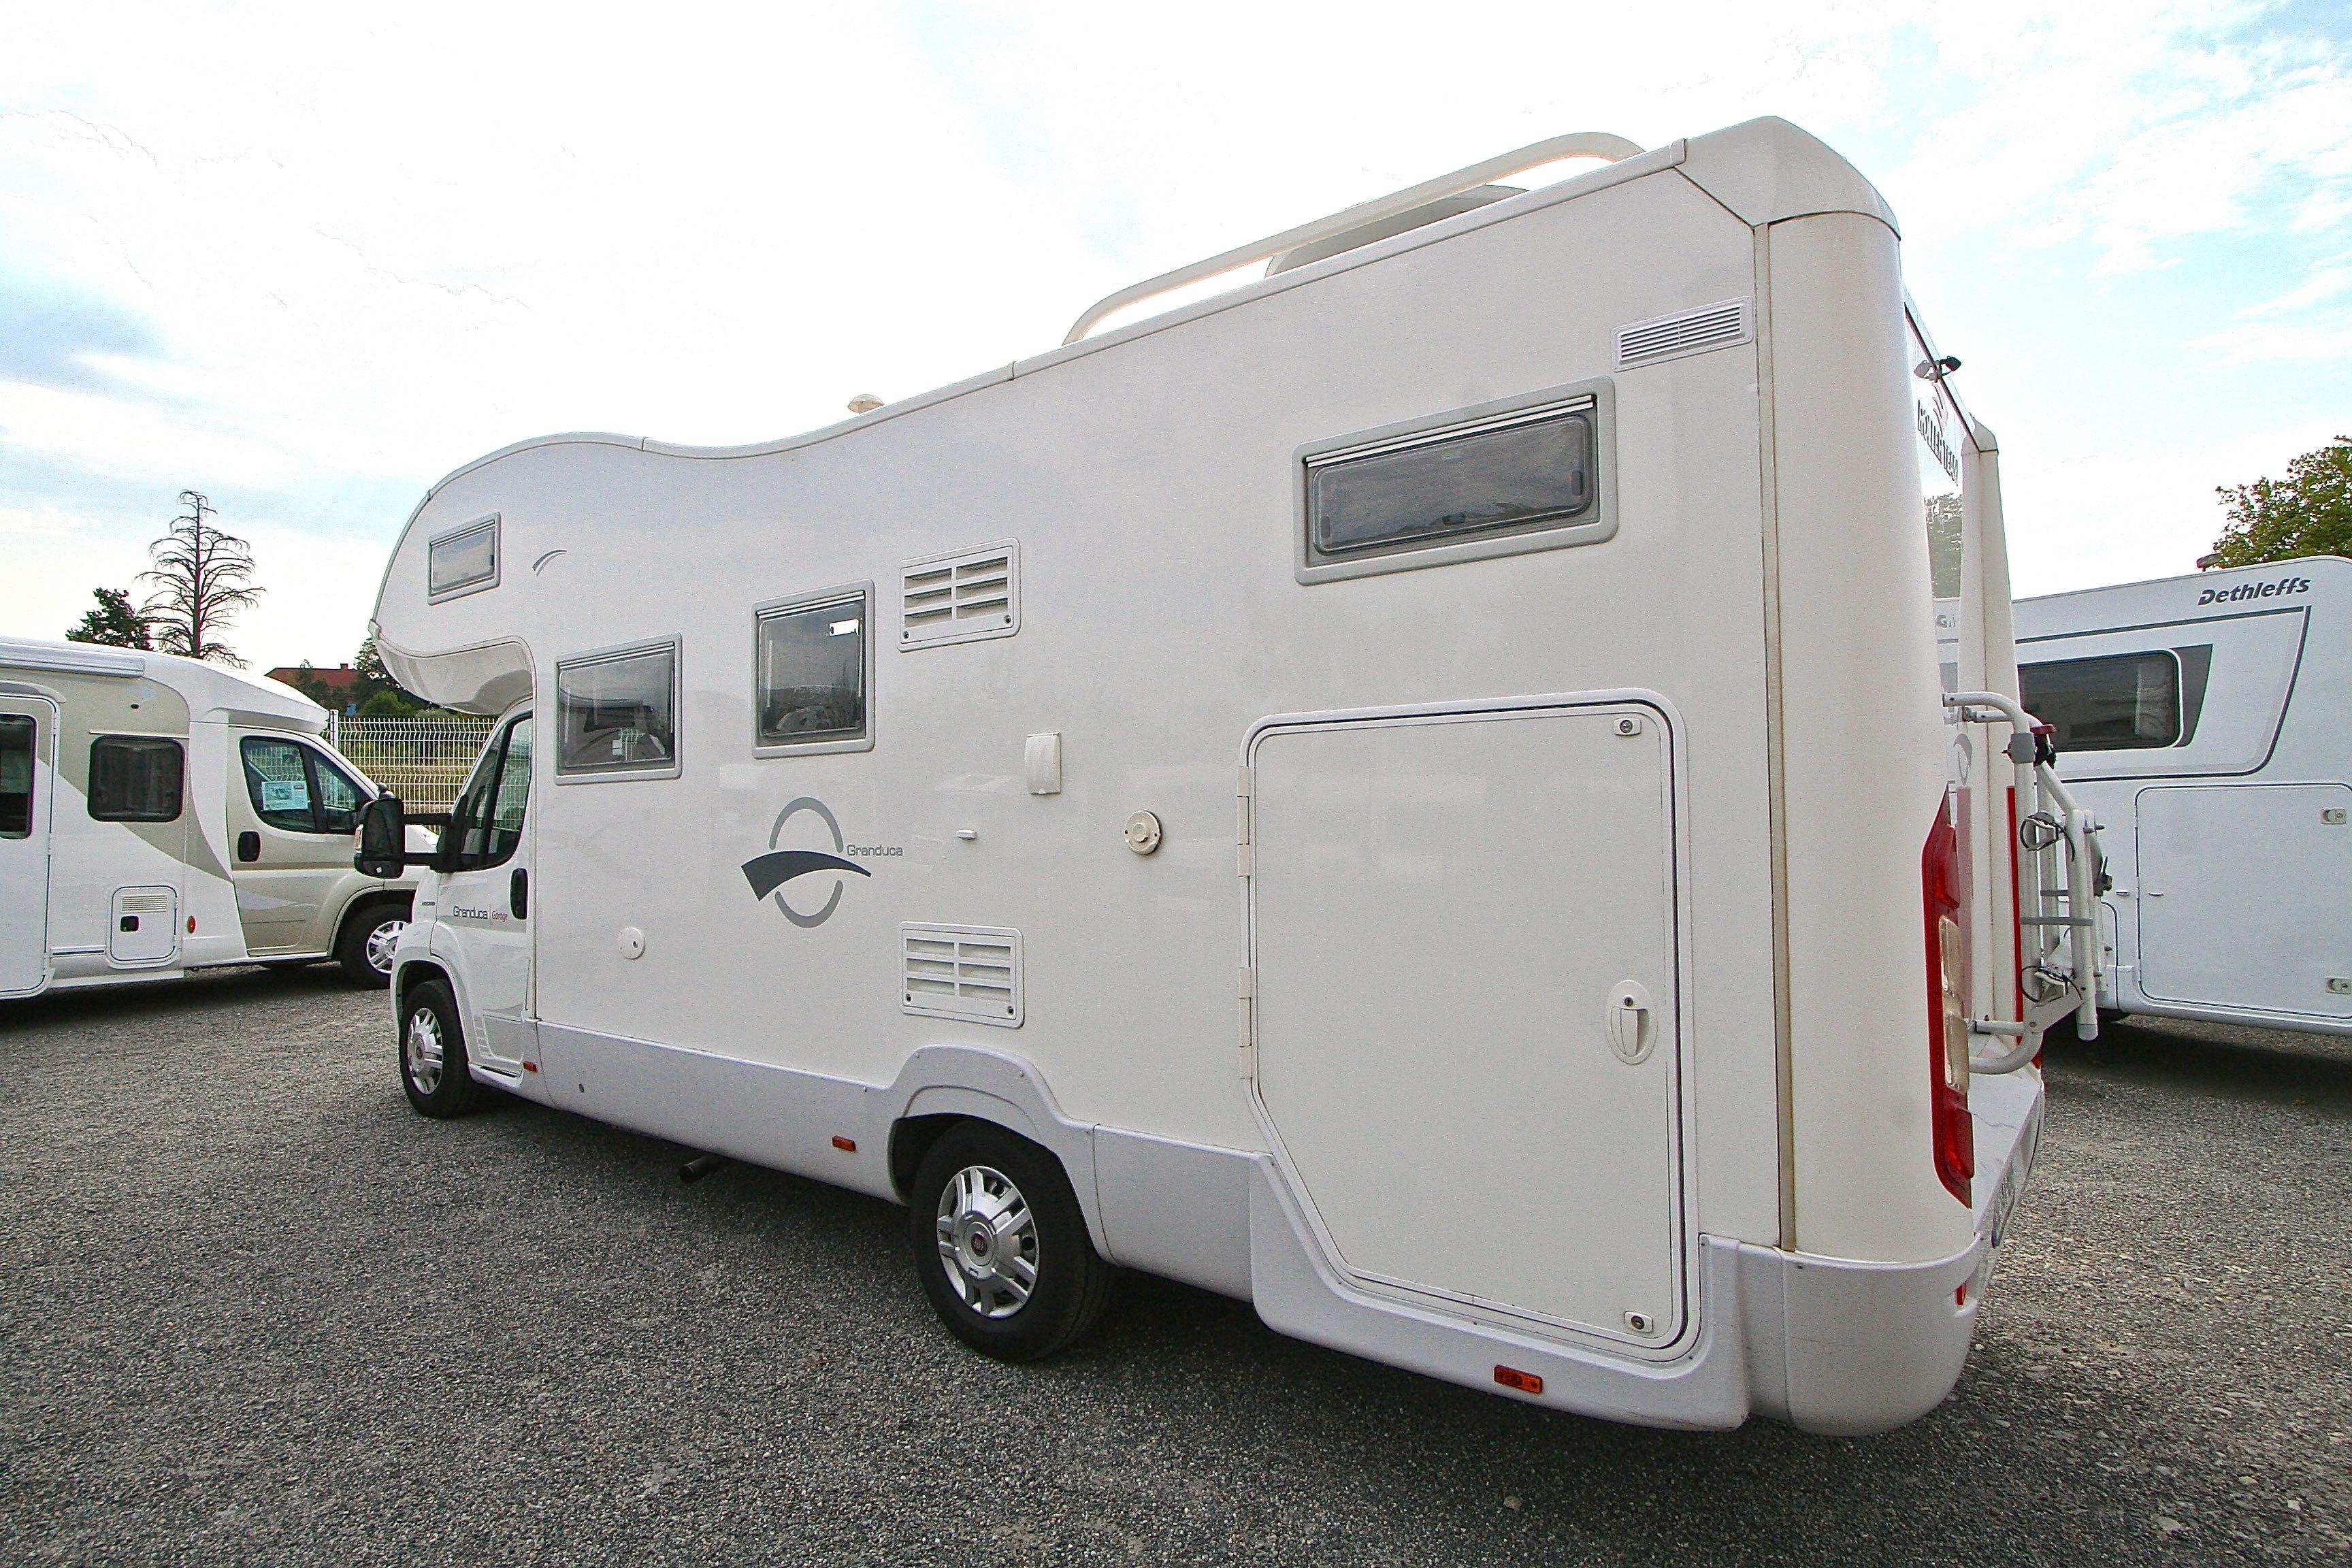 Roller team granduca garage occasion fiat camping car for Location garage caravane